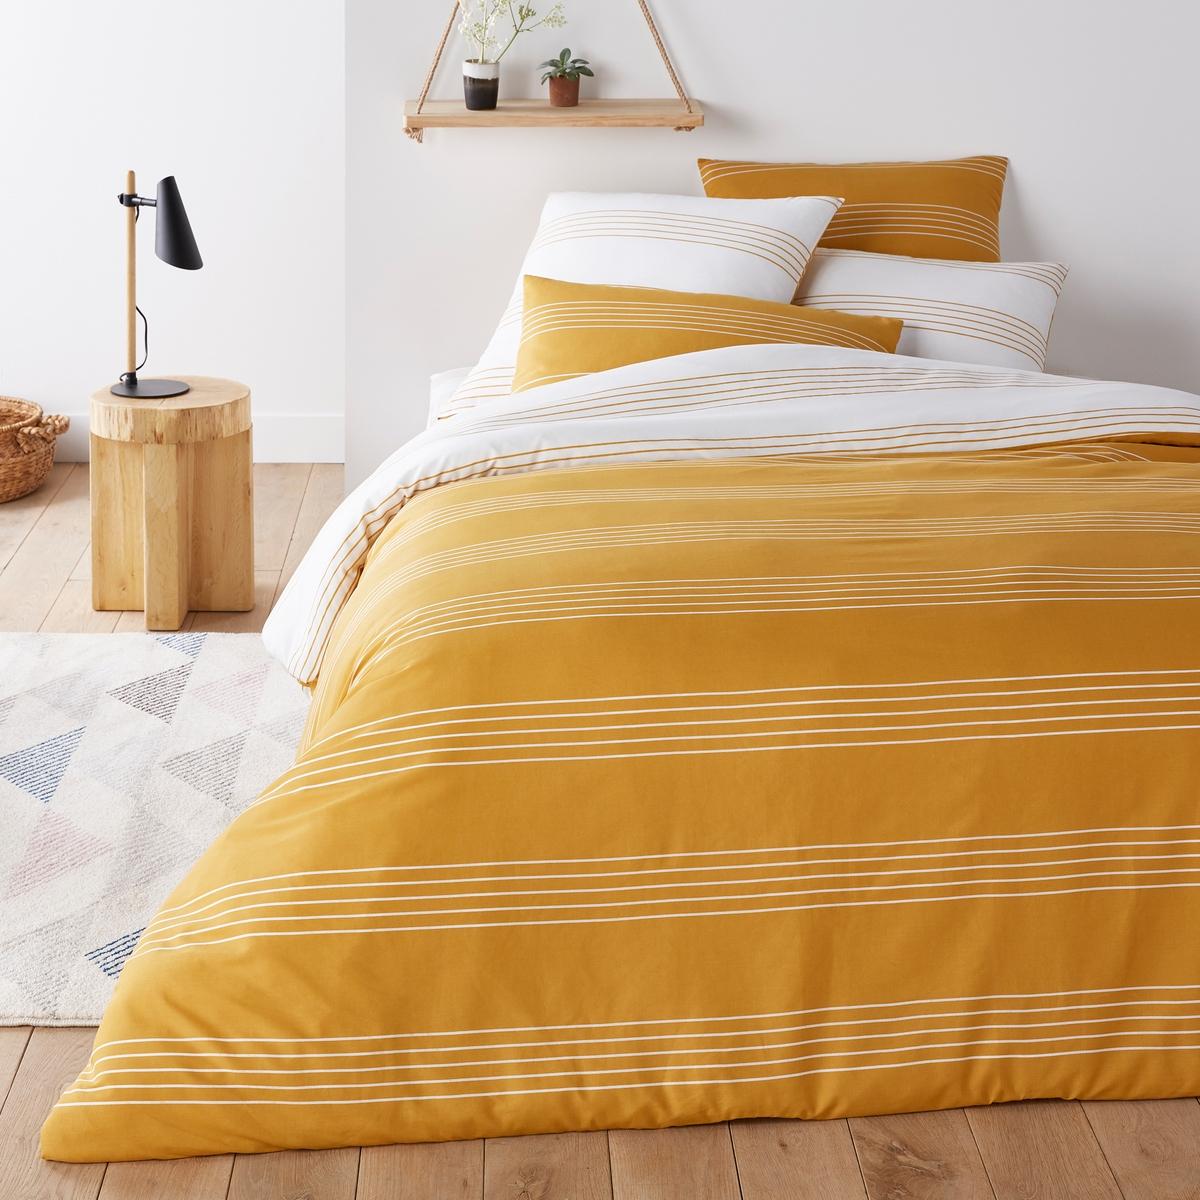 Пододеяльник La Redoute Горизонт 140 x 200 см желтый